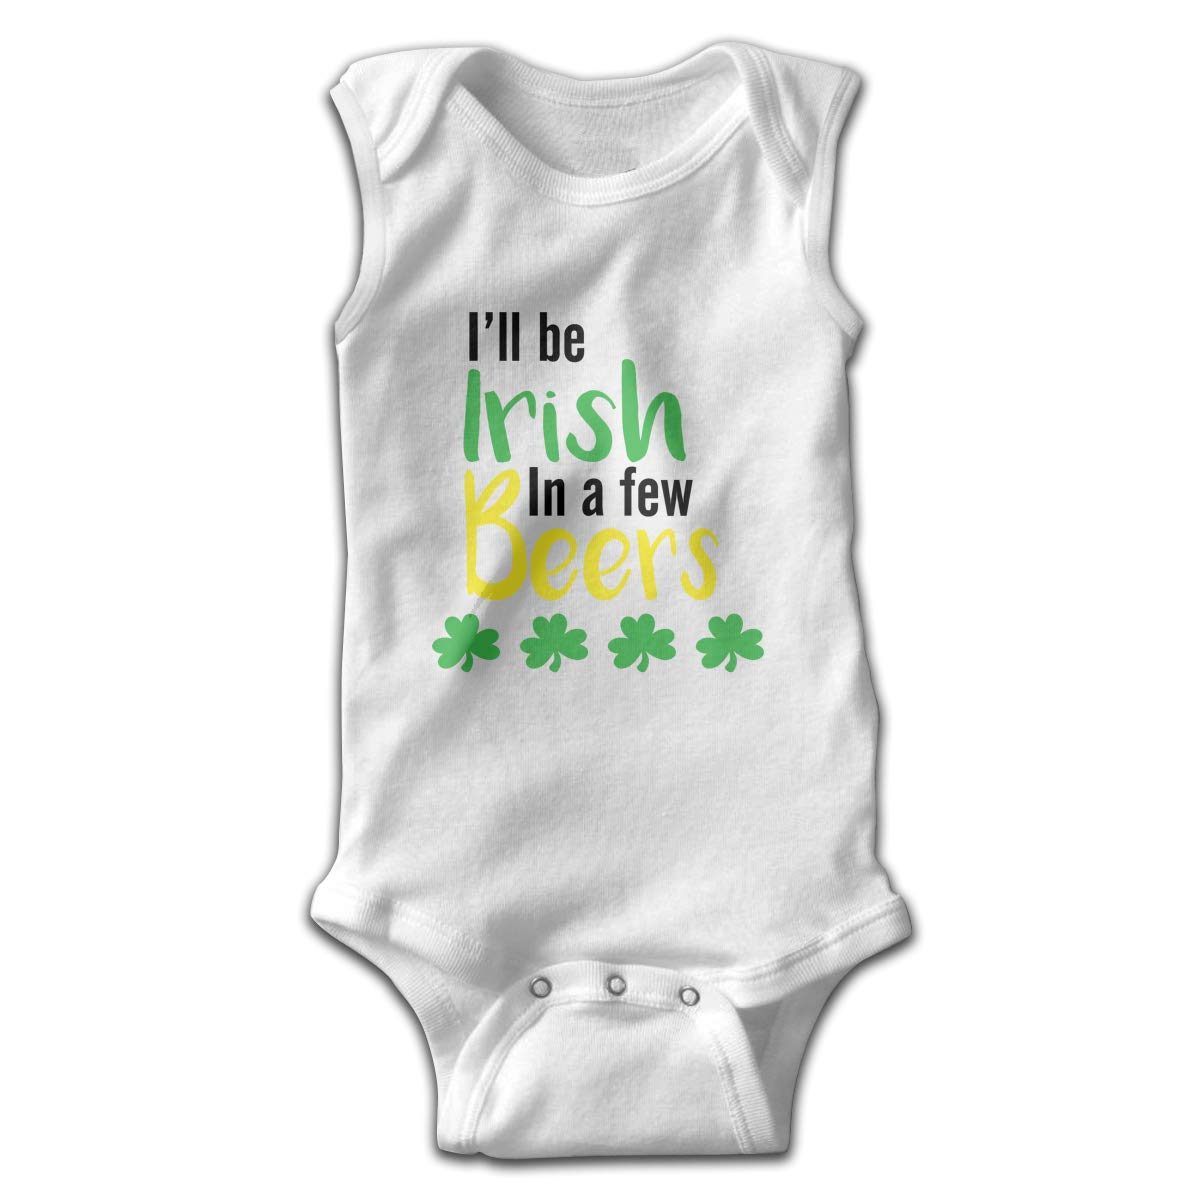 Newborn Baby Boys Rompers Sleeveless Cotton Onesie,Ill Be Irish in A Few Beers Bodysuit Summer Pajamas